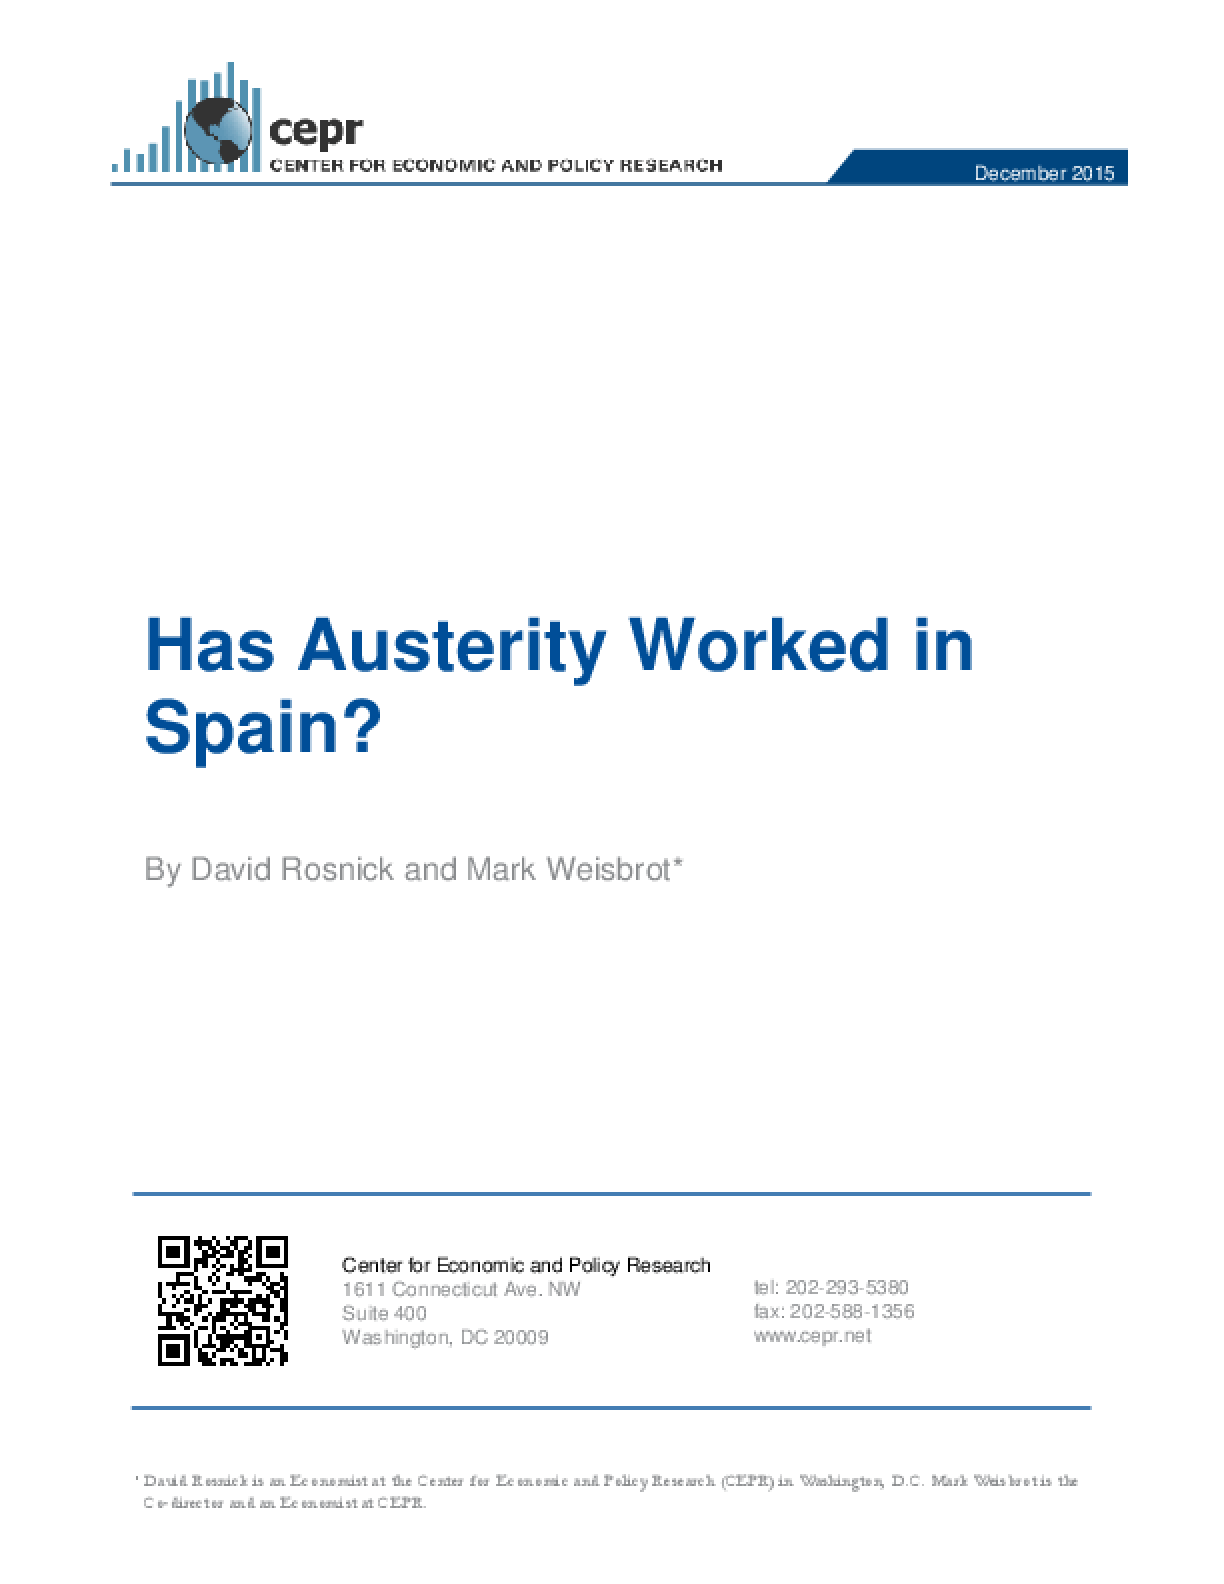 Has Austerity Worked in Spain?